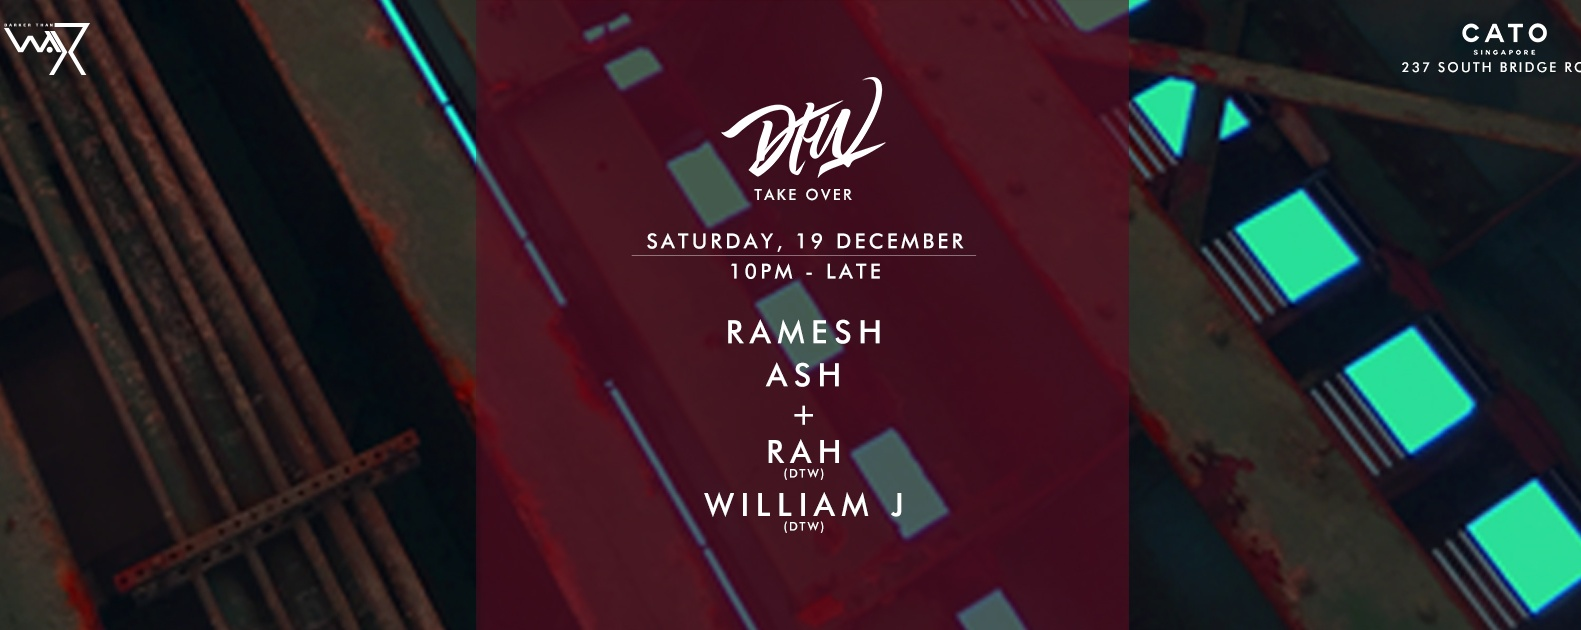 Darker Than Wax Take Over ft. Ramesh & Ash